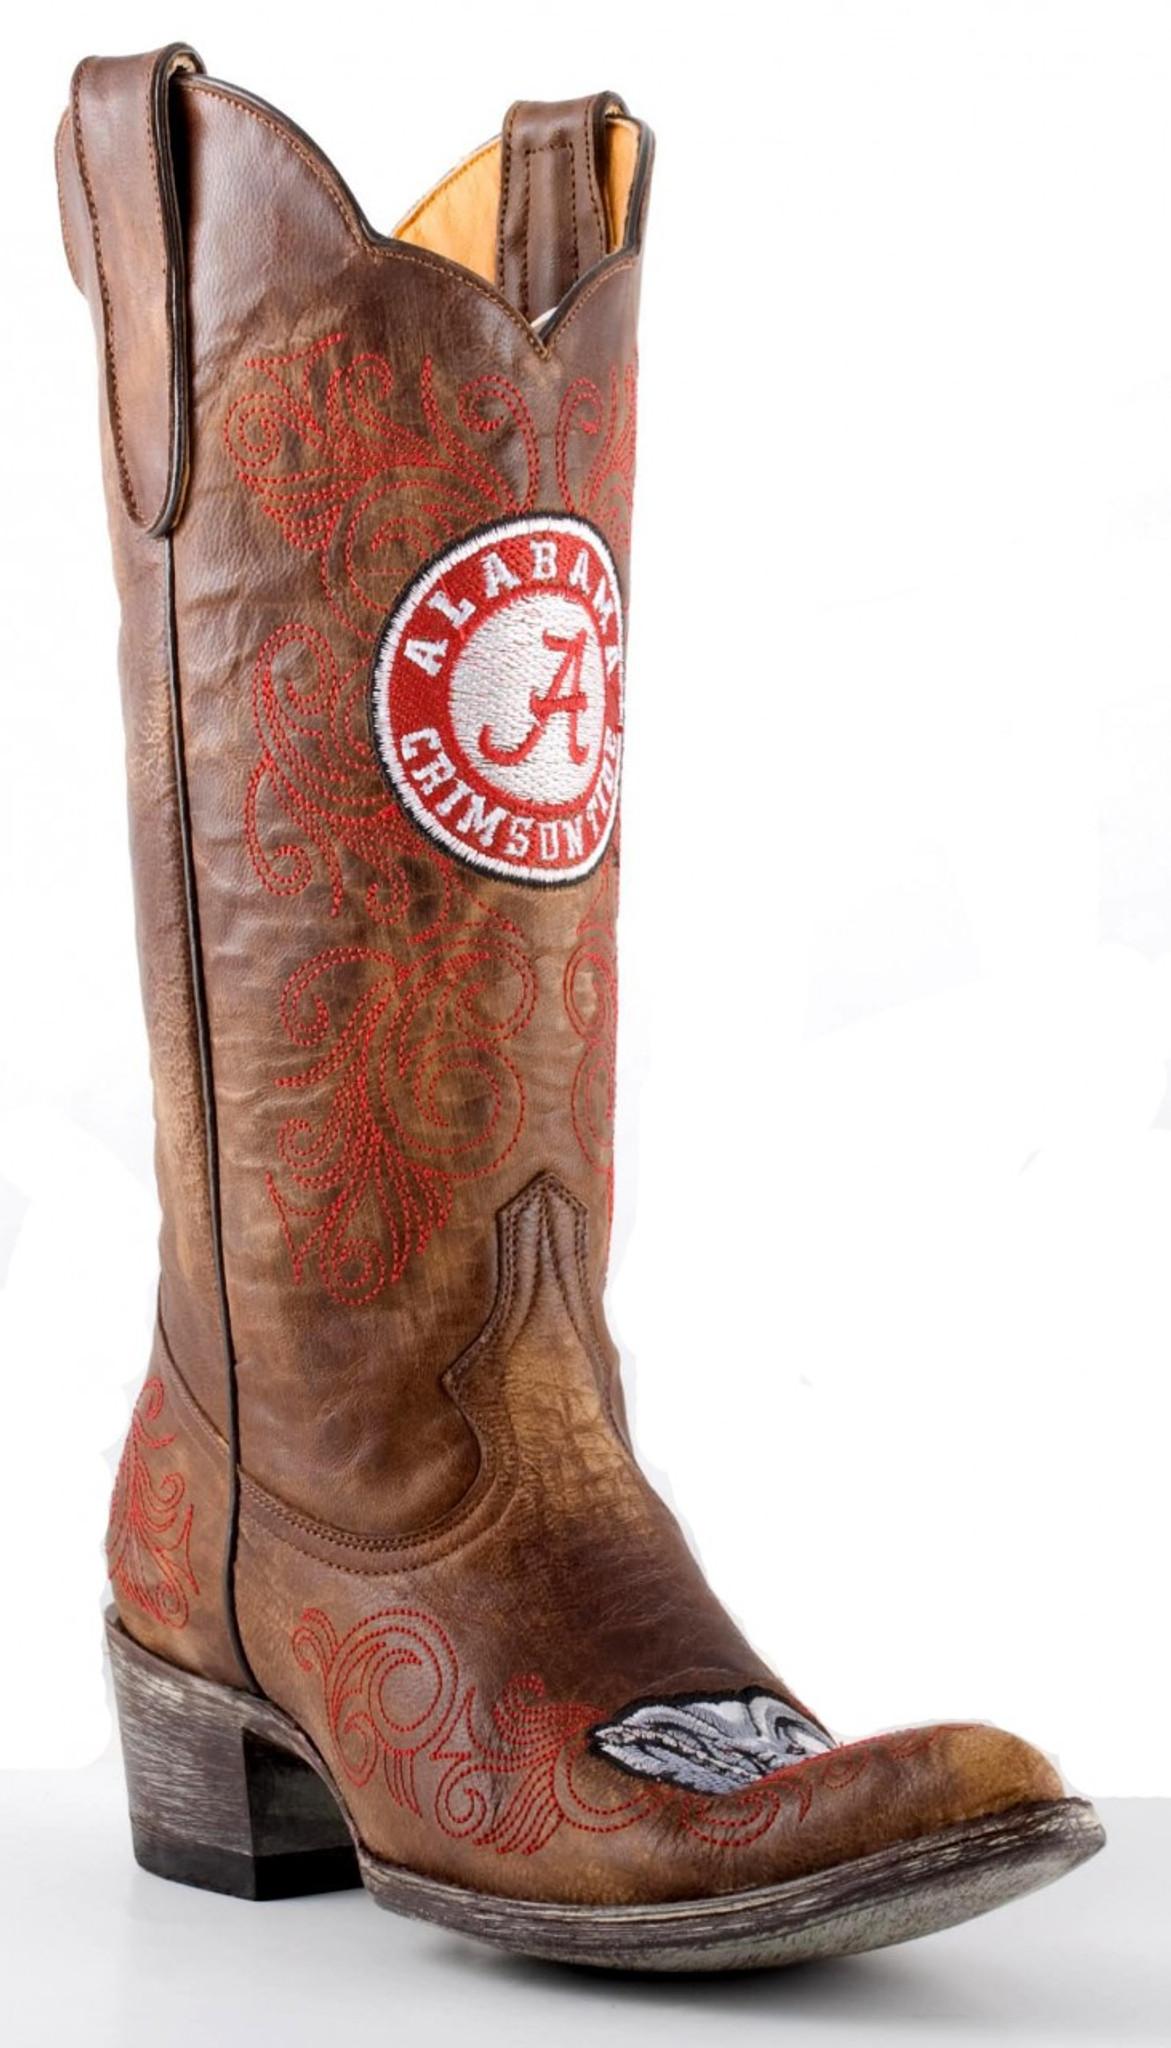 ddce1379570 Gameday University Of Alabama Women's Boots